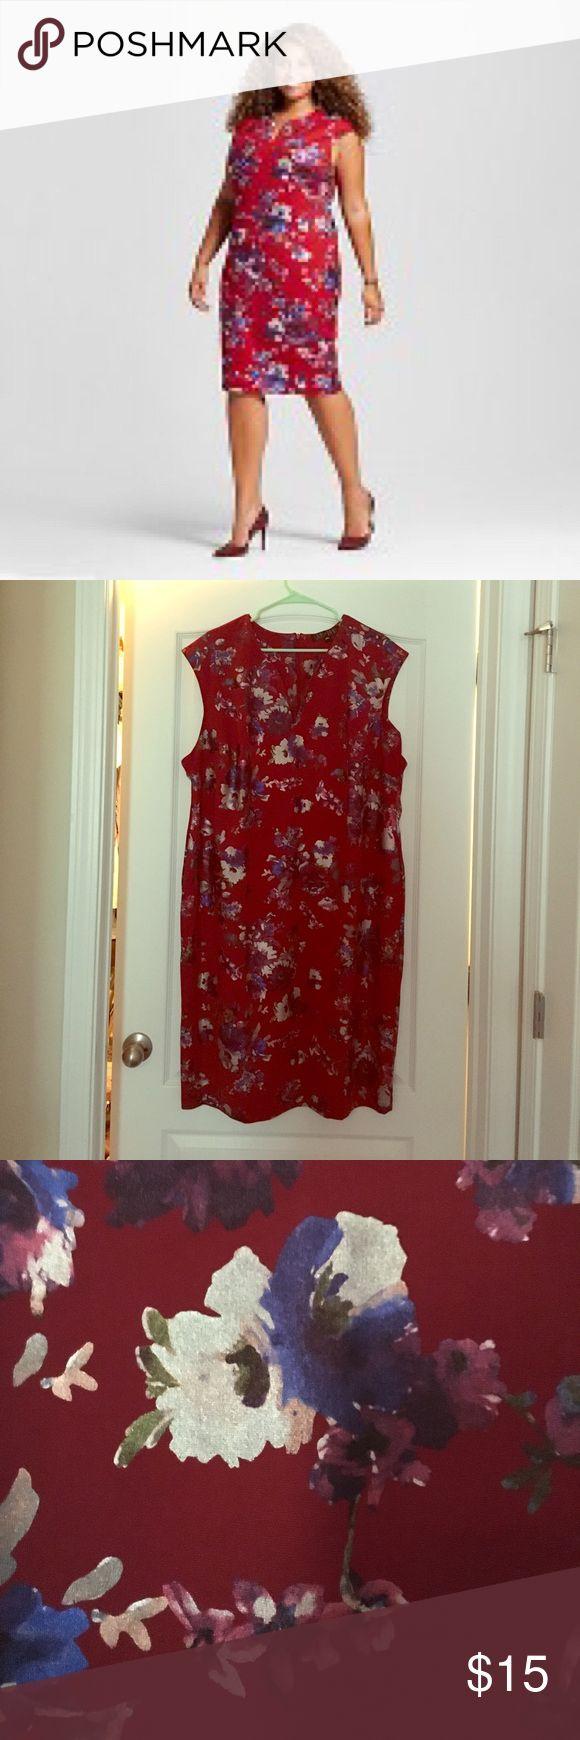 Sami + Dani, size 22 dress, never worn Red, floral, cap sleeve dress sami + dani Dresses